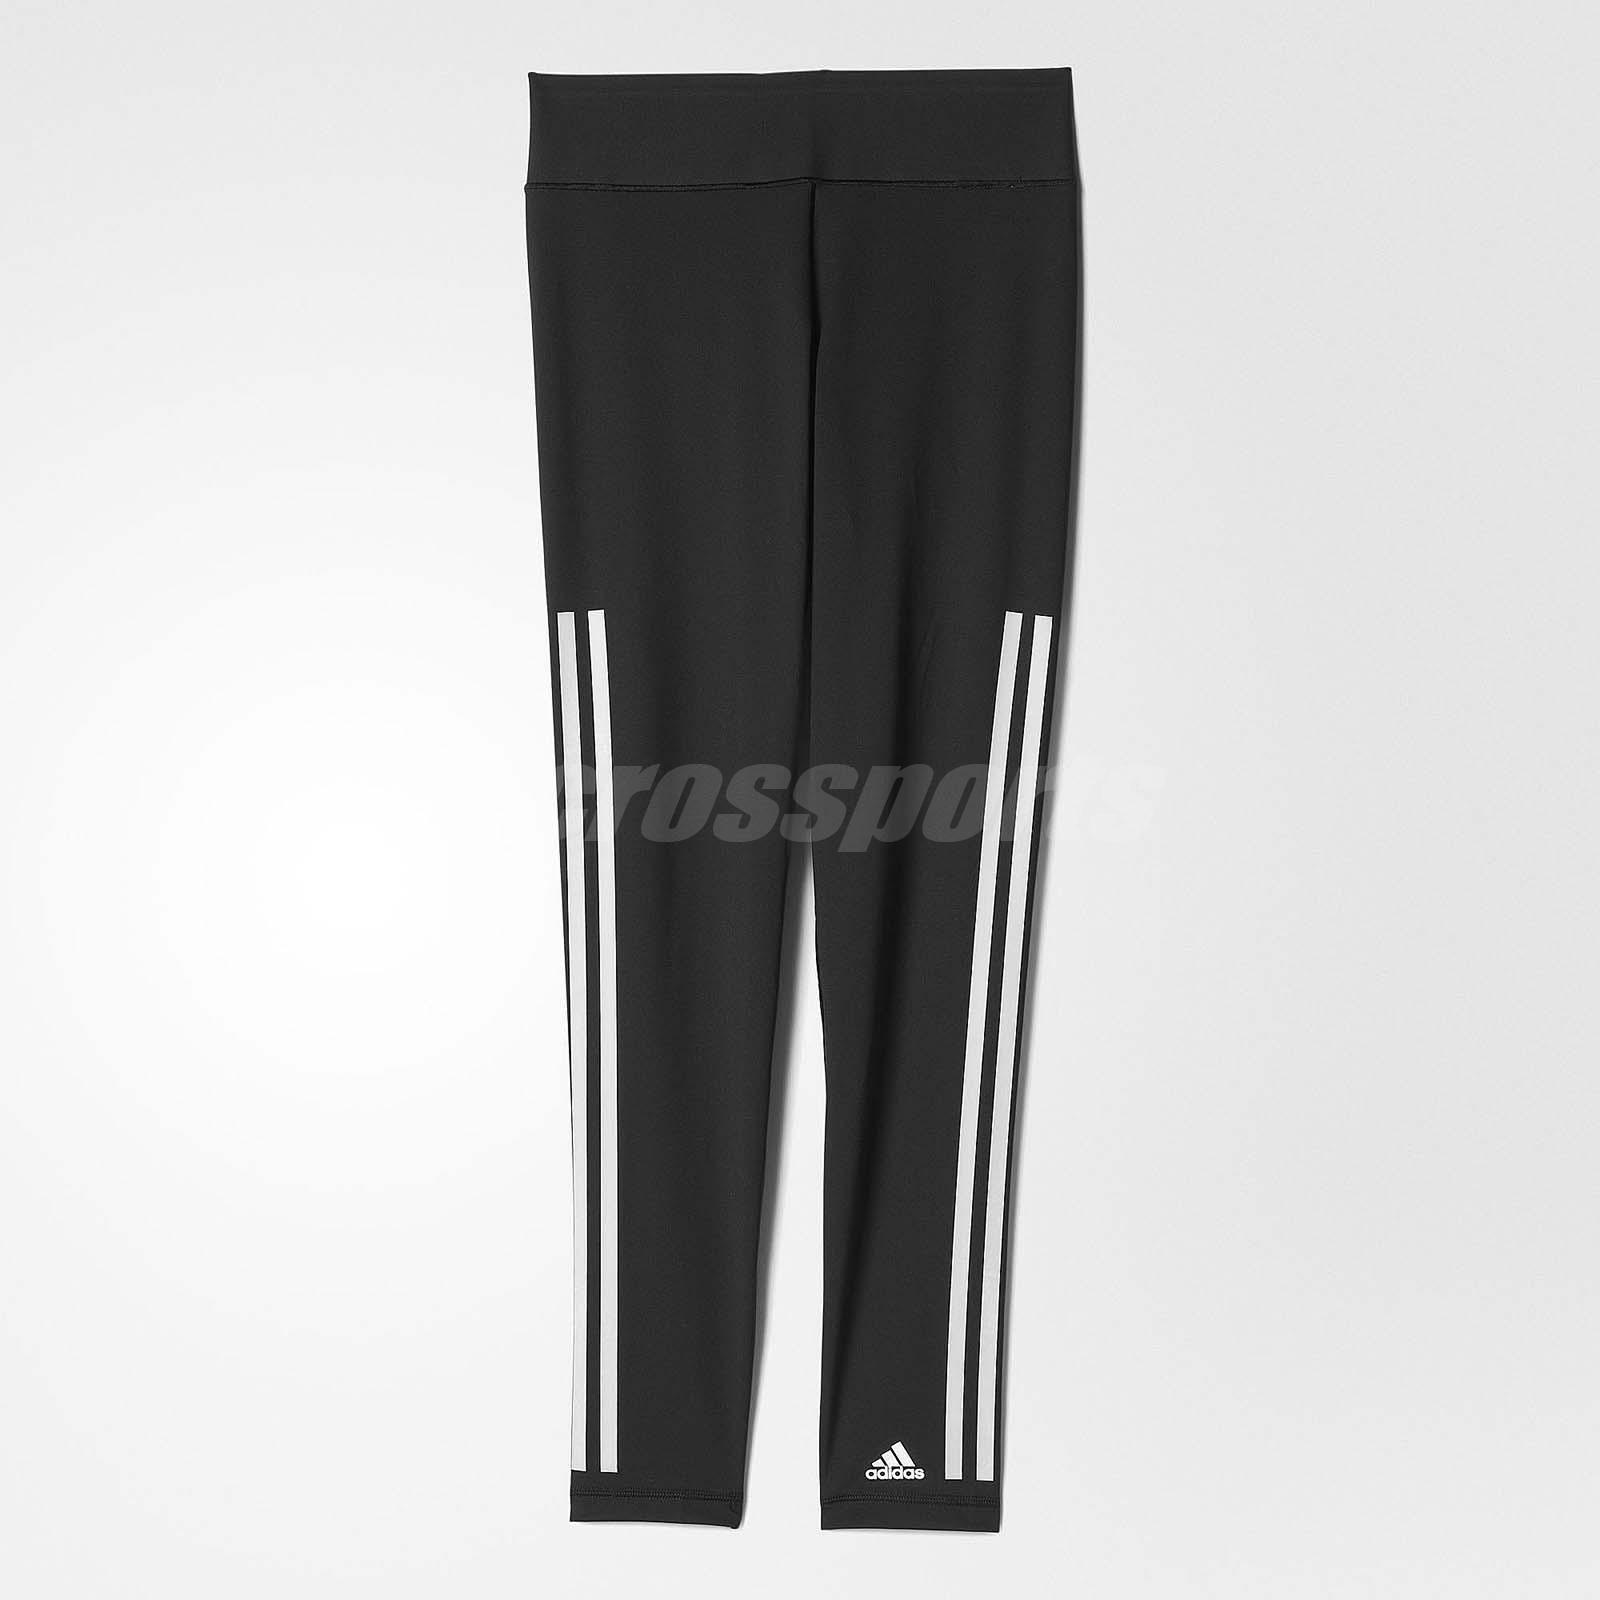 adidas Women Ultimate Fit 3-Stripes Long Tight Running Sports Black White  AJ5052